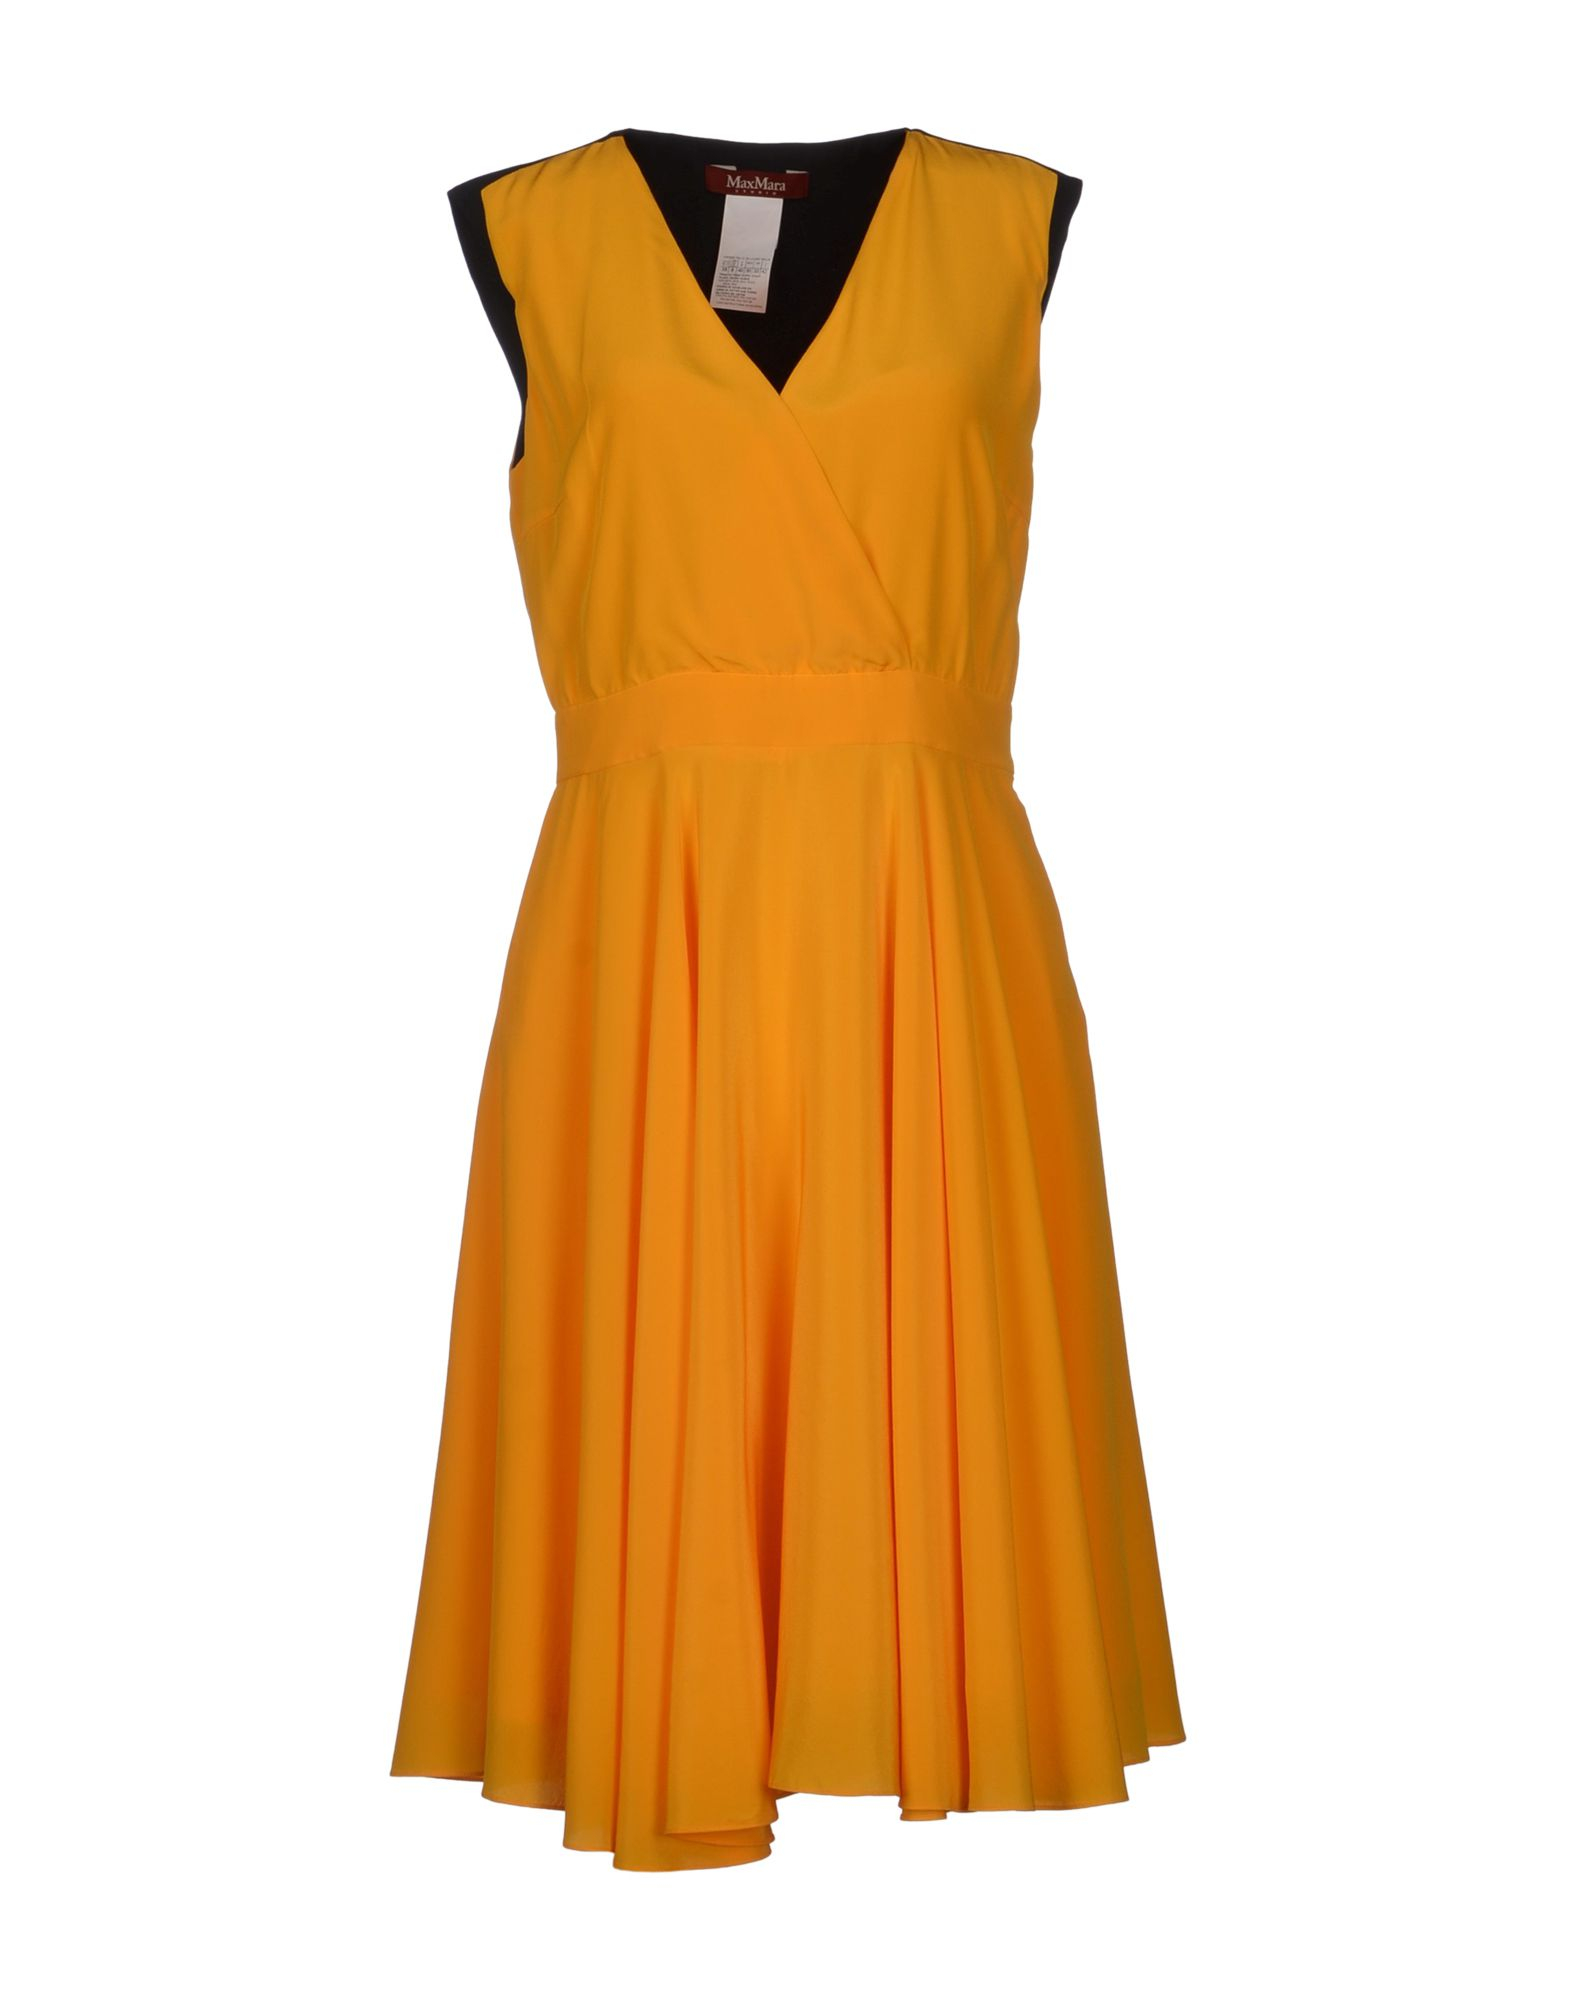 max mara studio kneelength dress in orange apricot lyst. Black Bedroom Furniture Sets. Home Design Ideas